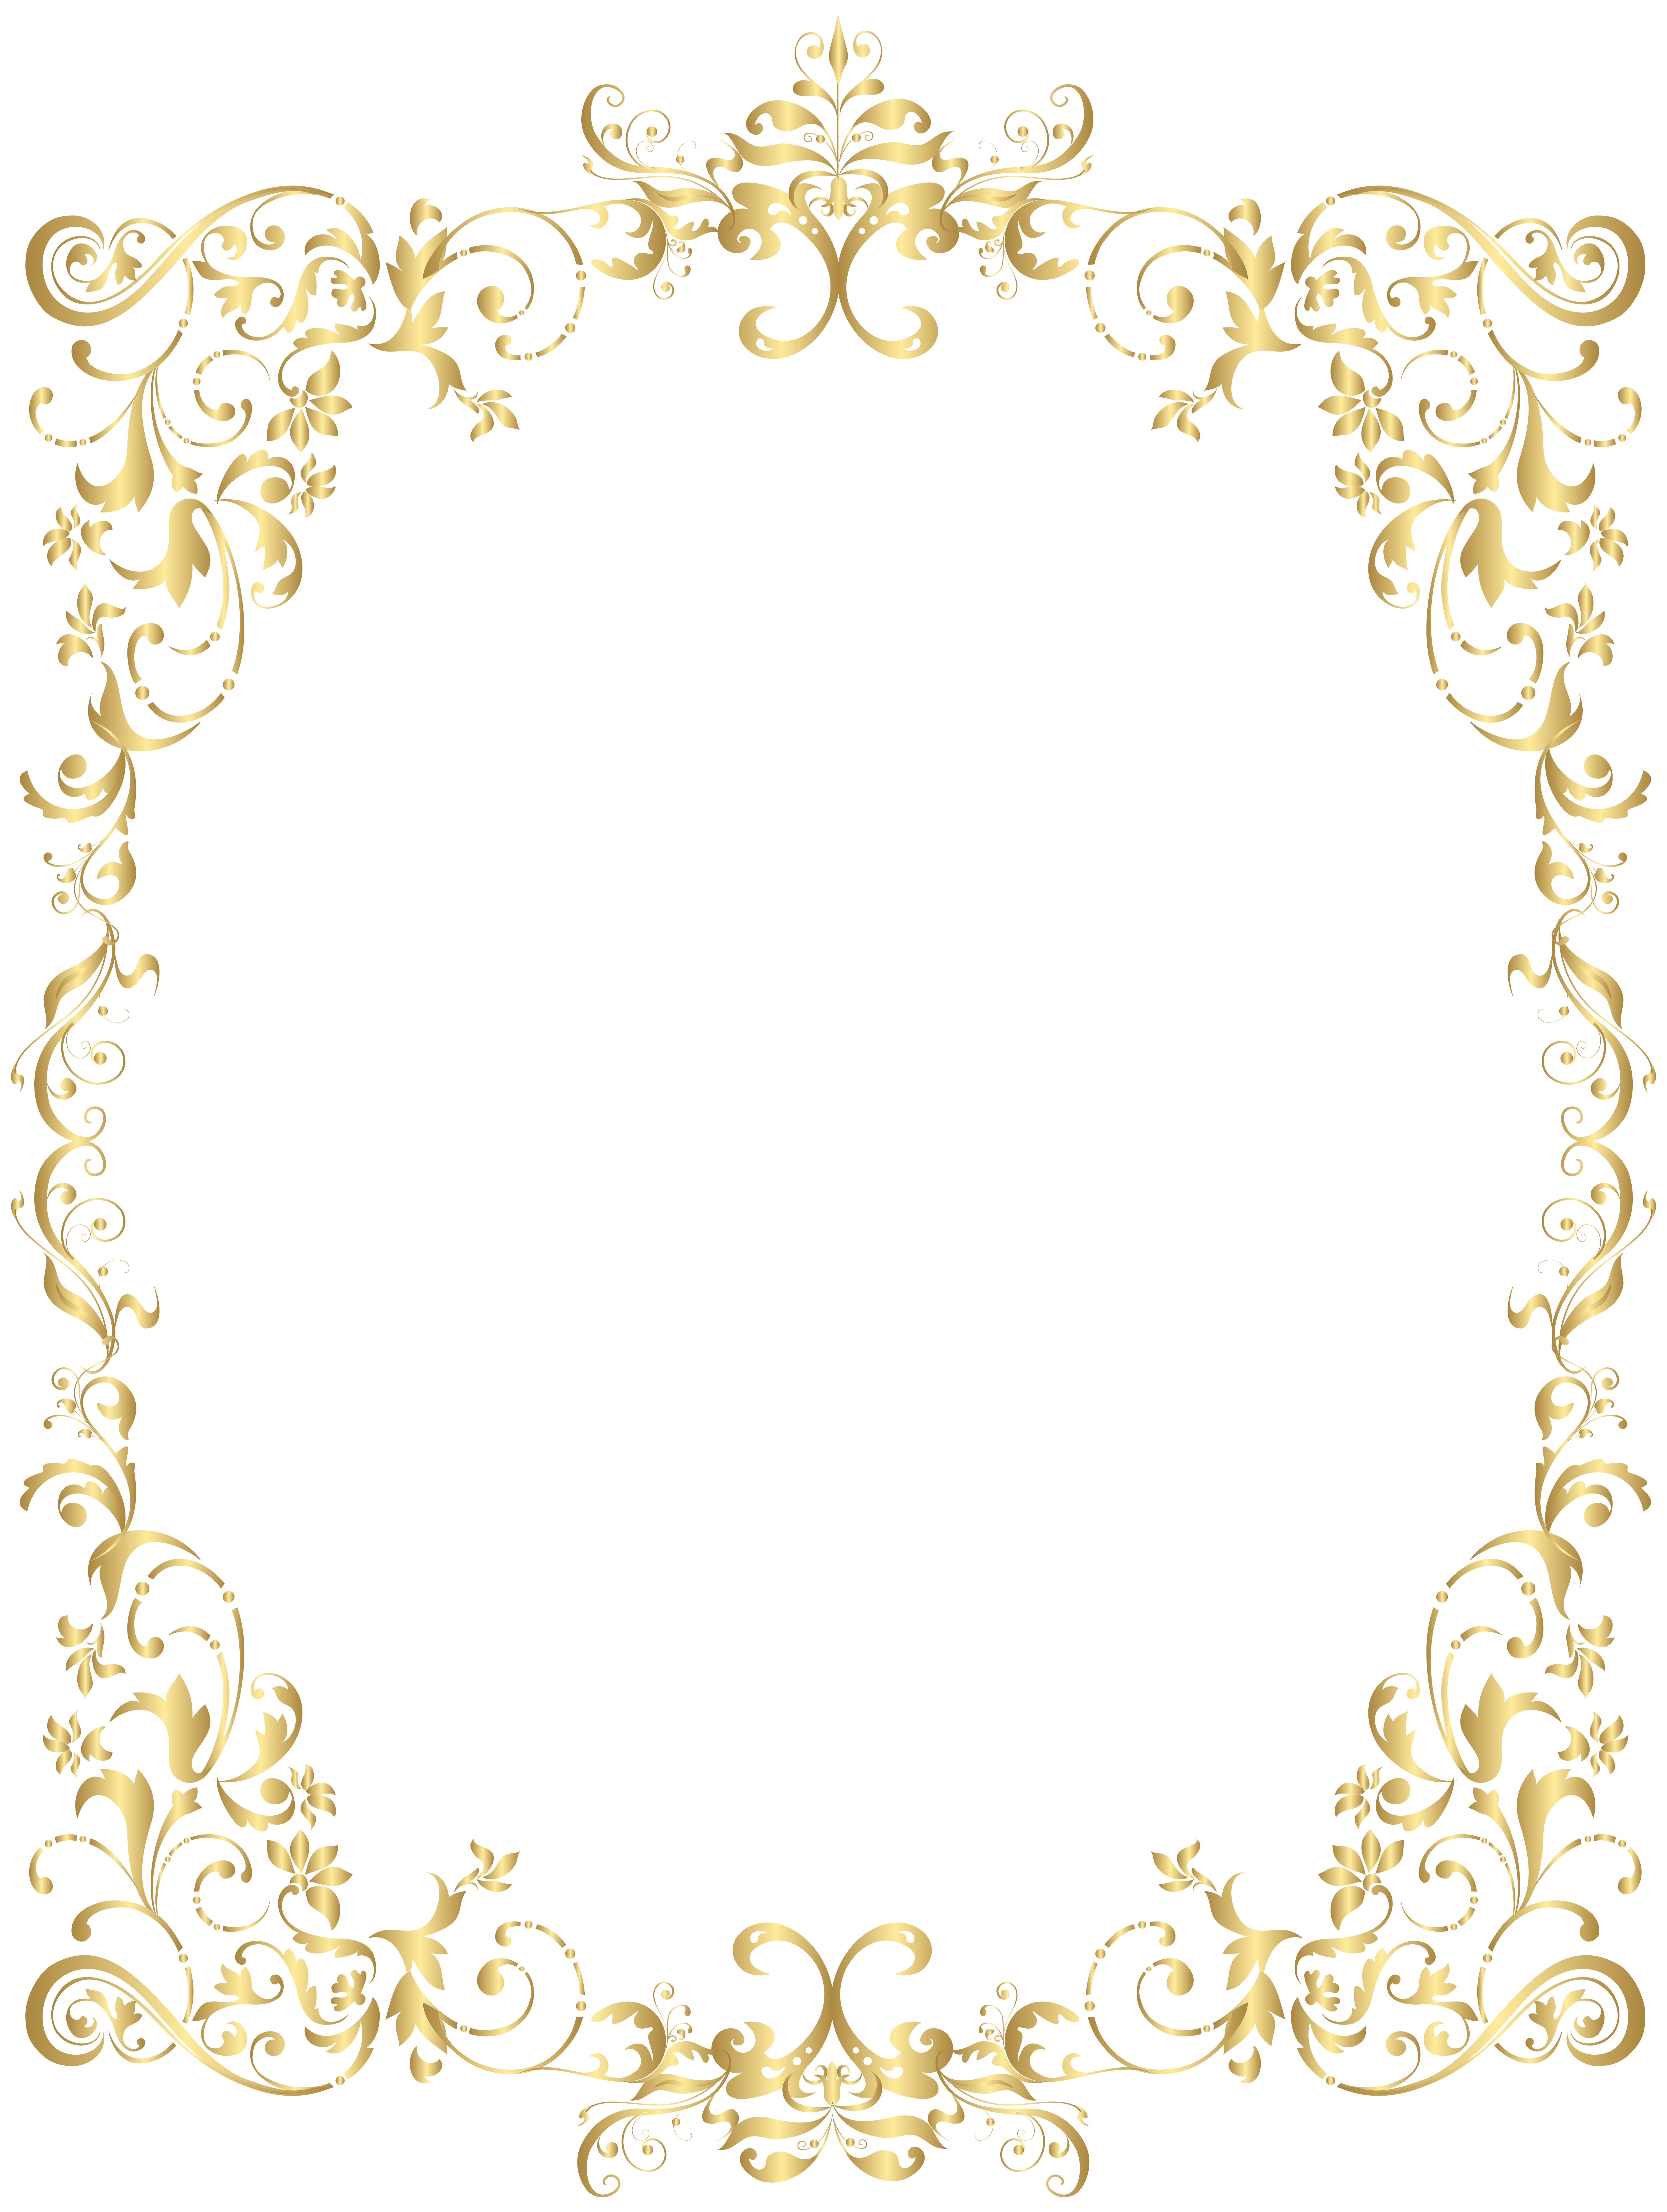 Gold borders clipart image transparent download Elegant gold border clipart images gallery for free download ... image transparent download